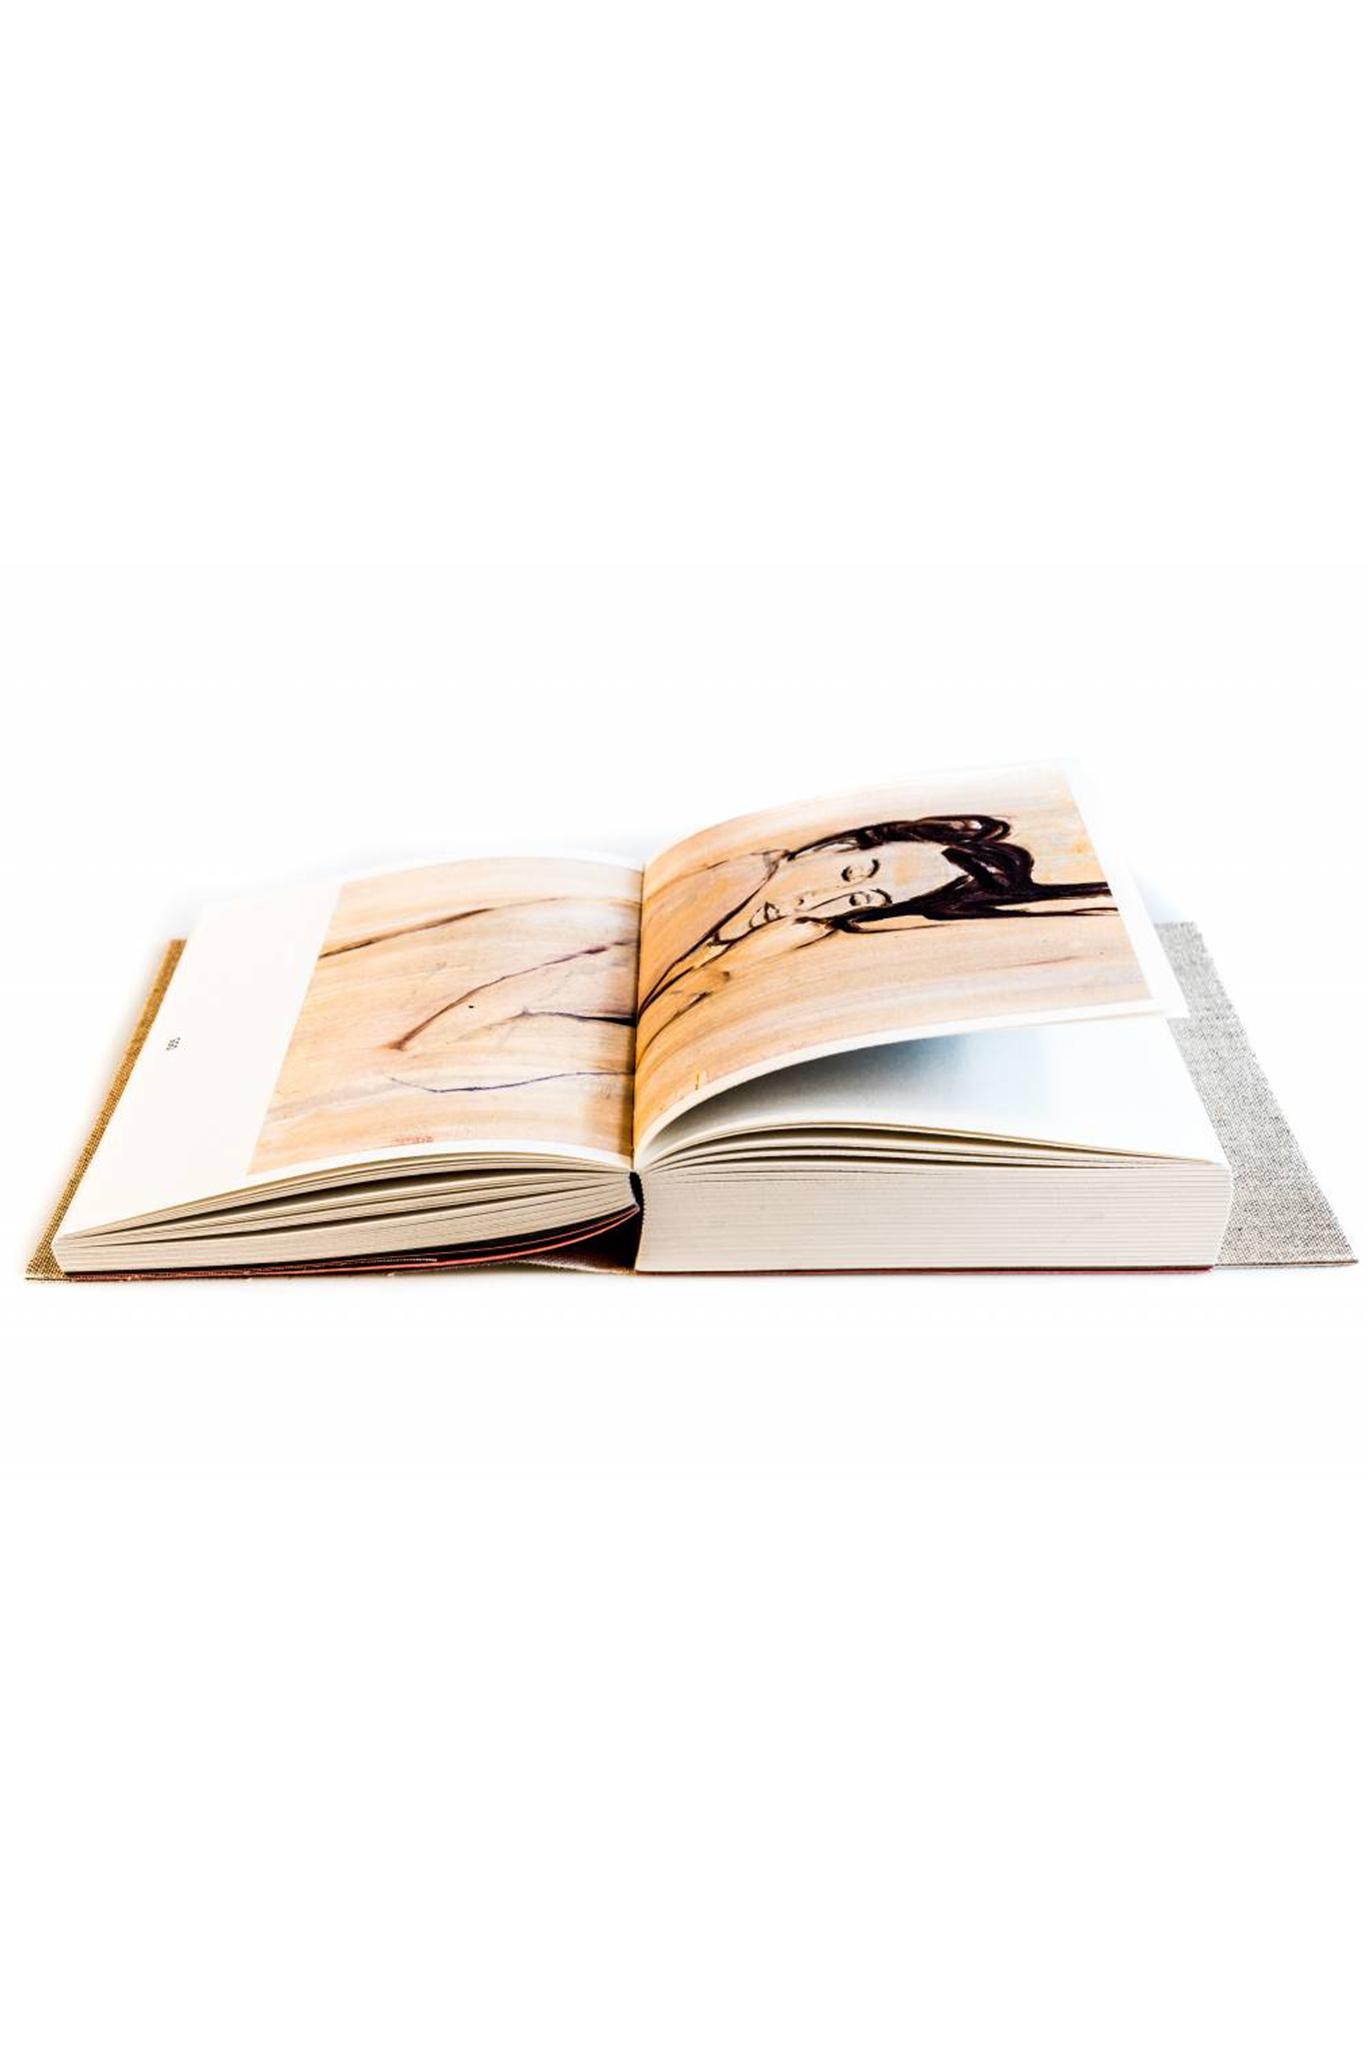 Book Portraits - Jasper Krabbé